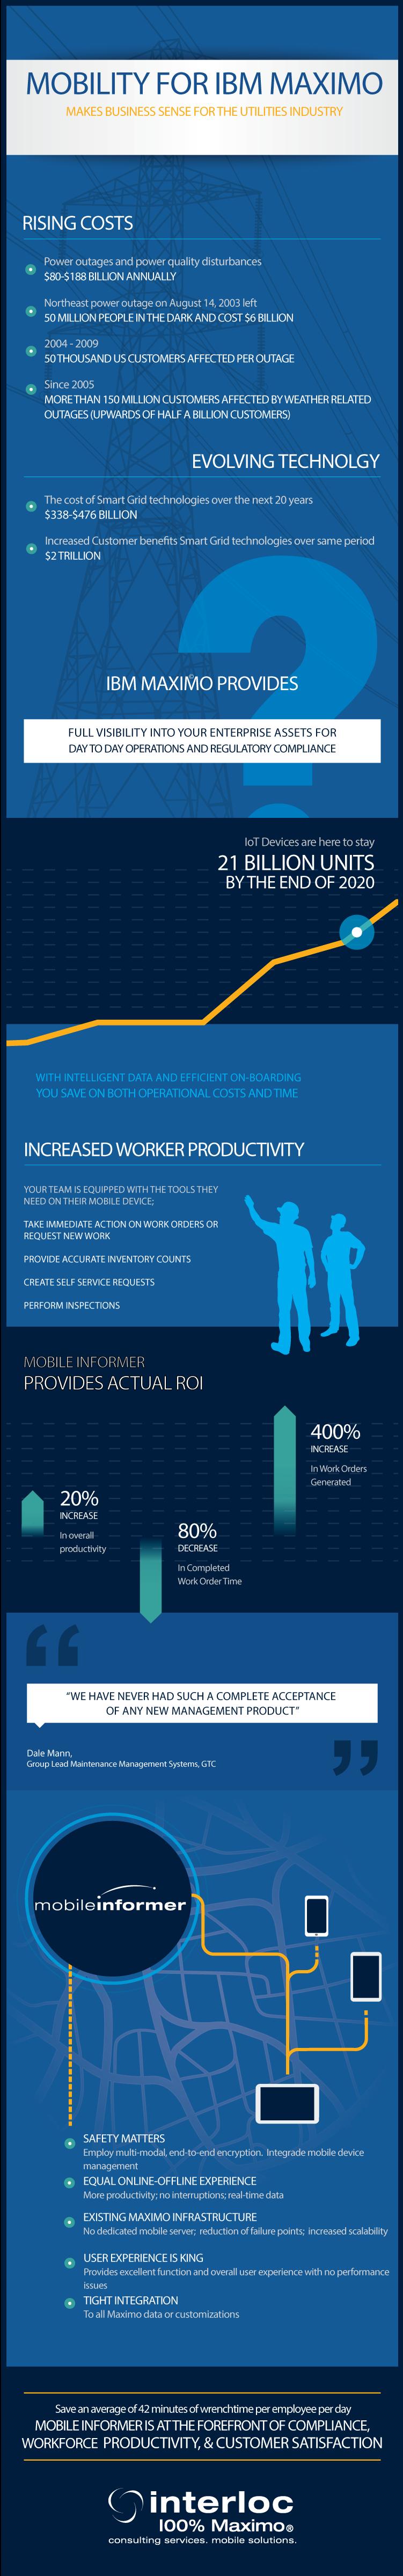 2016-interloc_mobile_informer_infographic_utilities.png